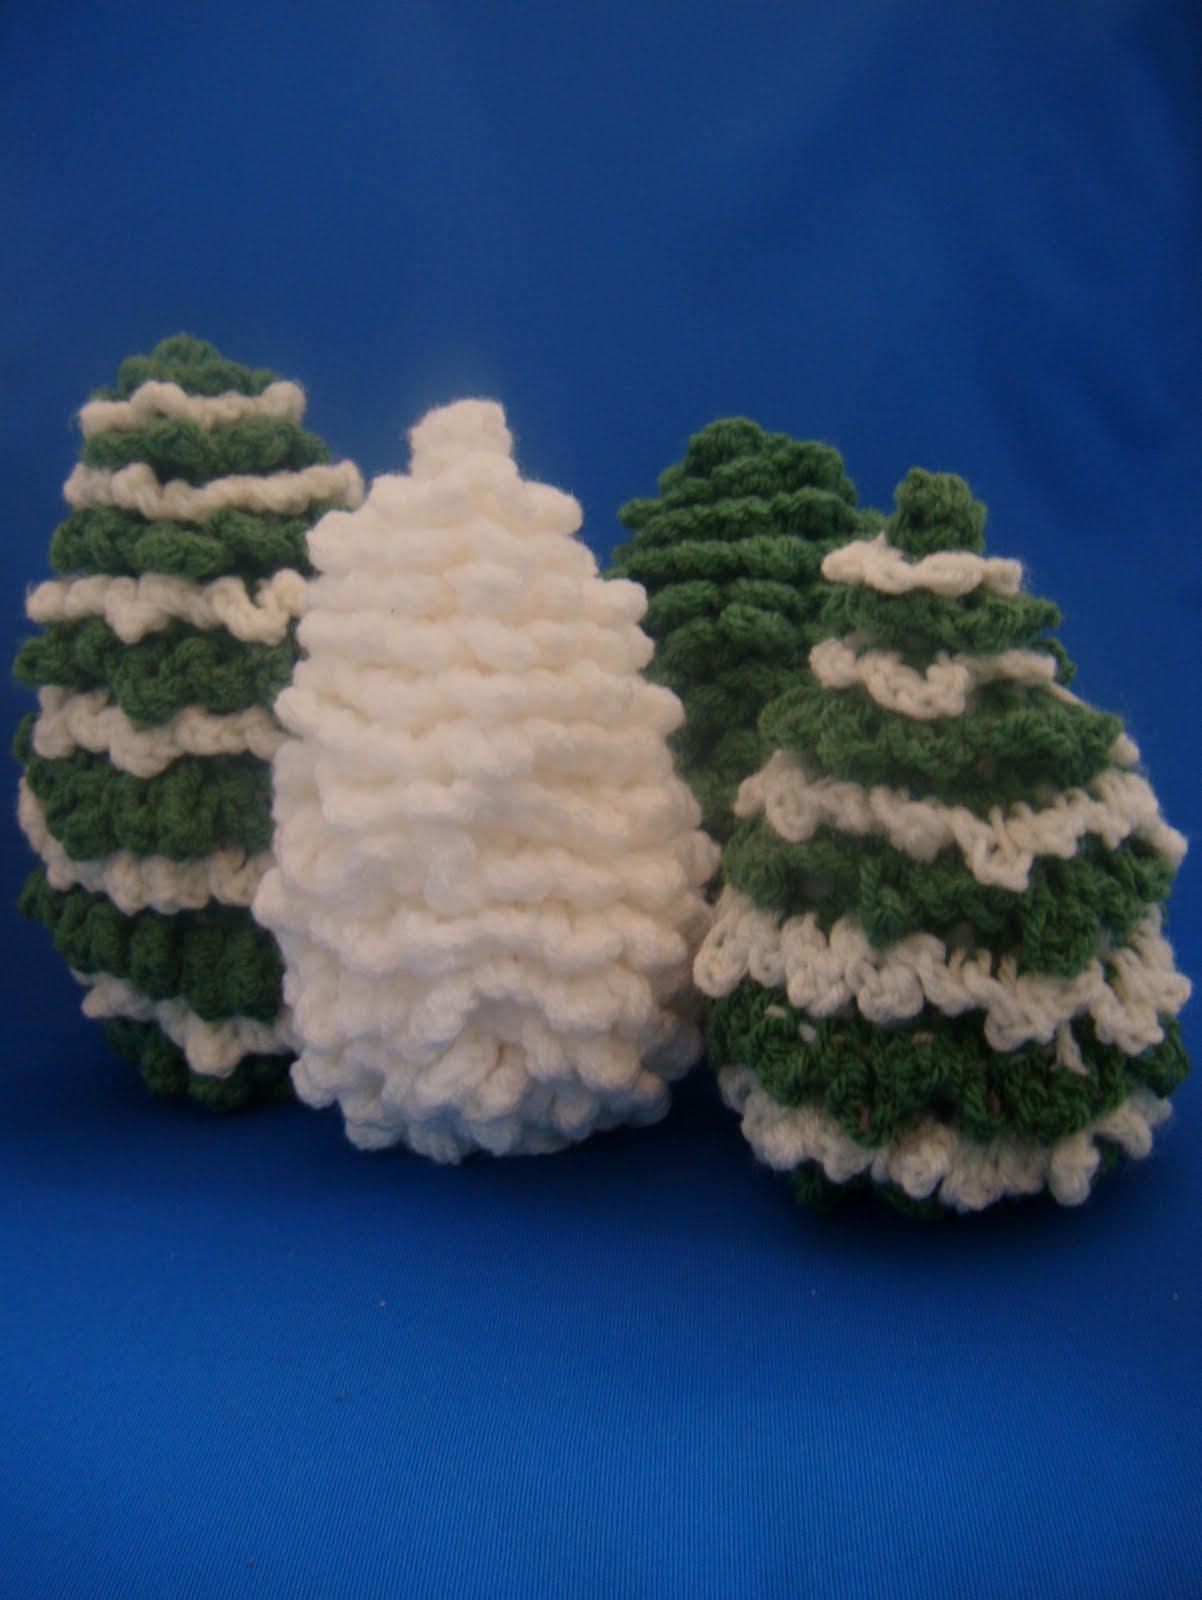 Amigurumi Christmas Tree Patterns : A la Sascha: Gratis amigurumi haakpatroon kerstboom